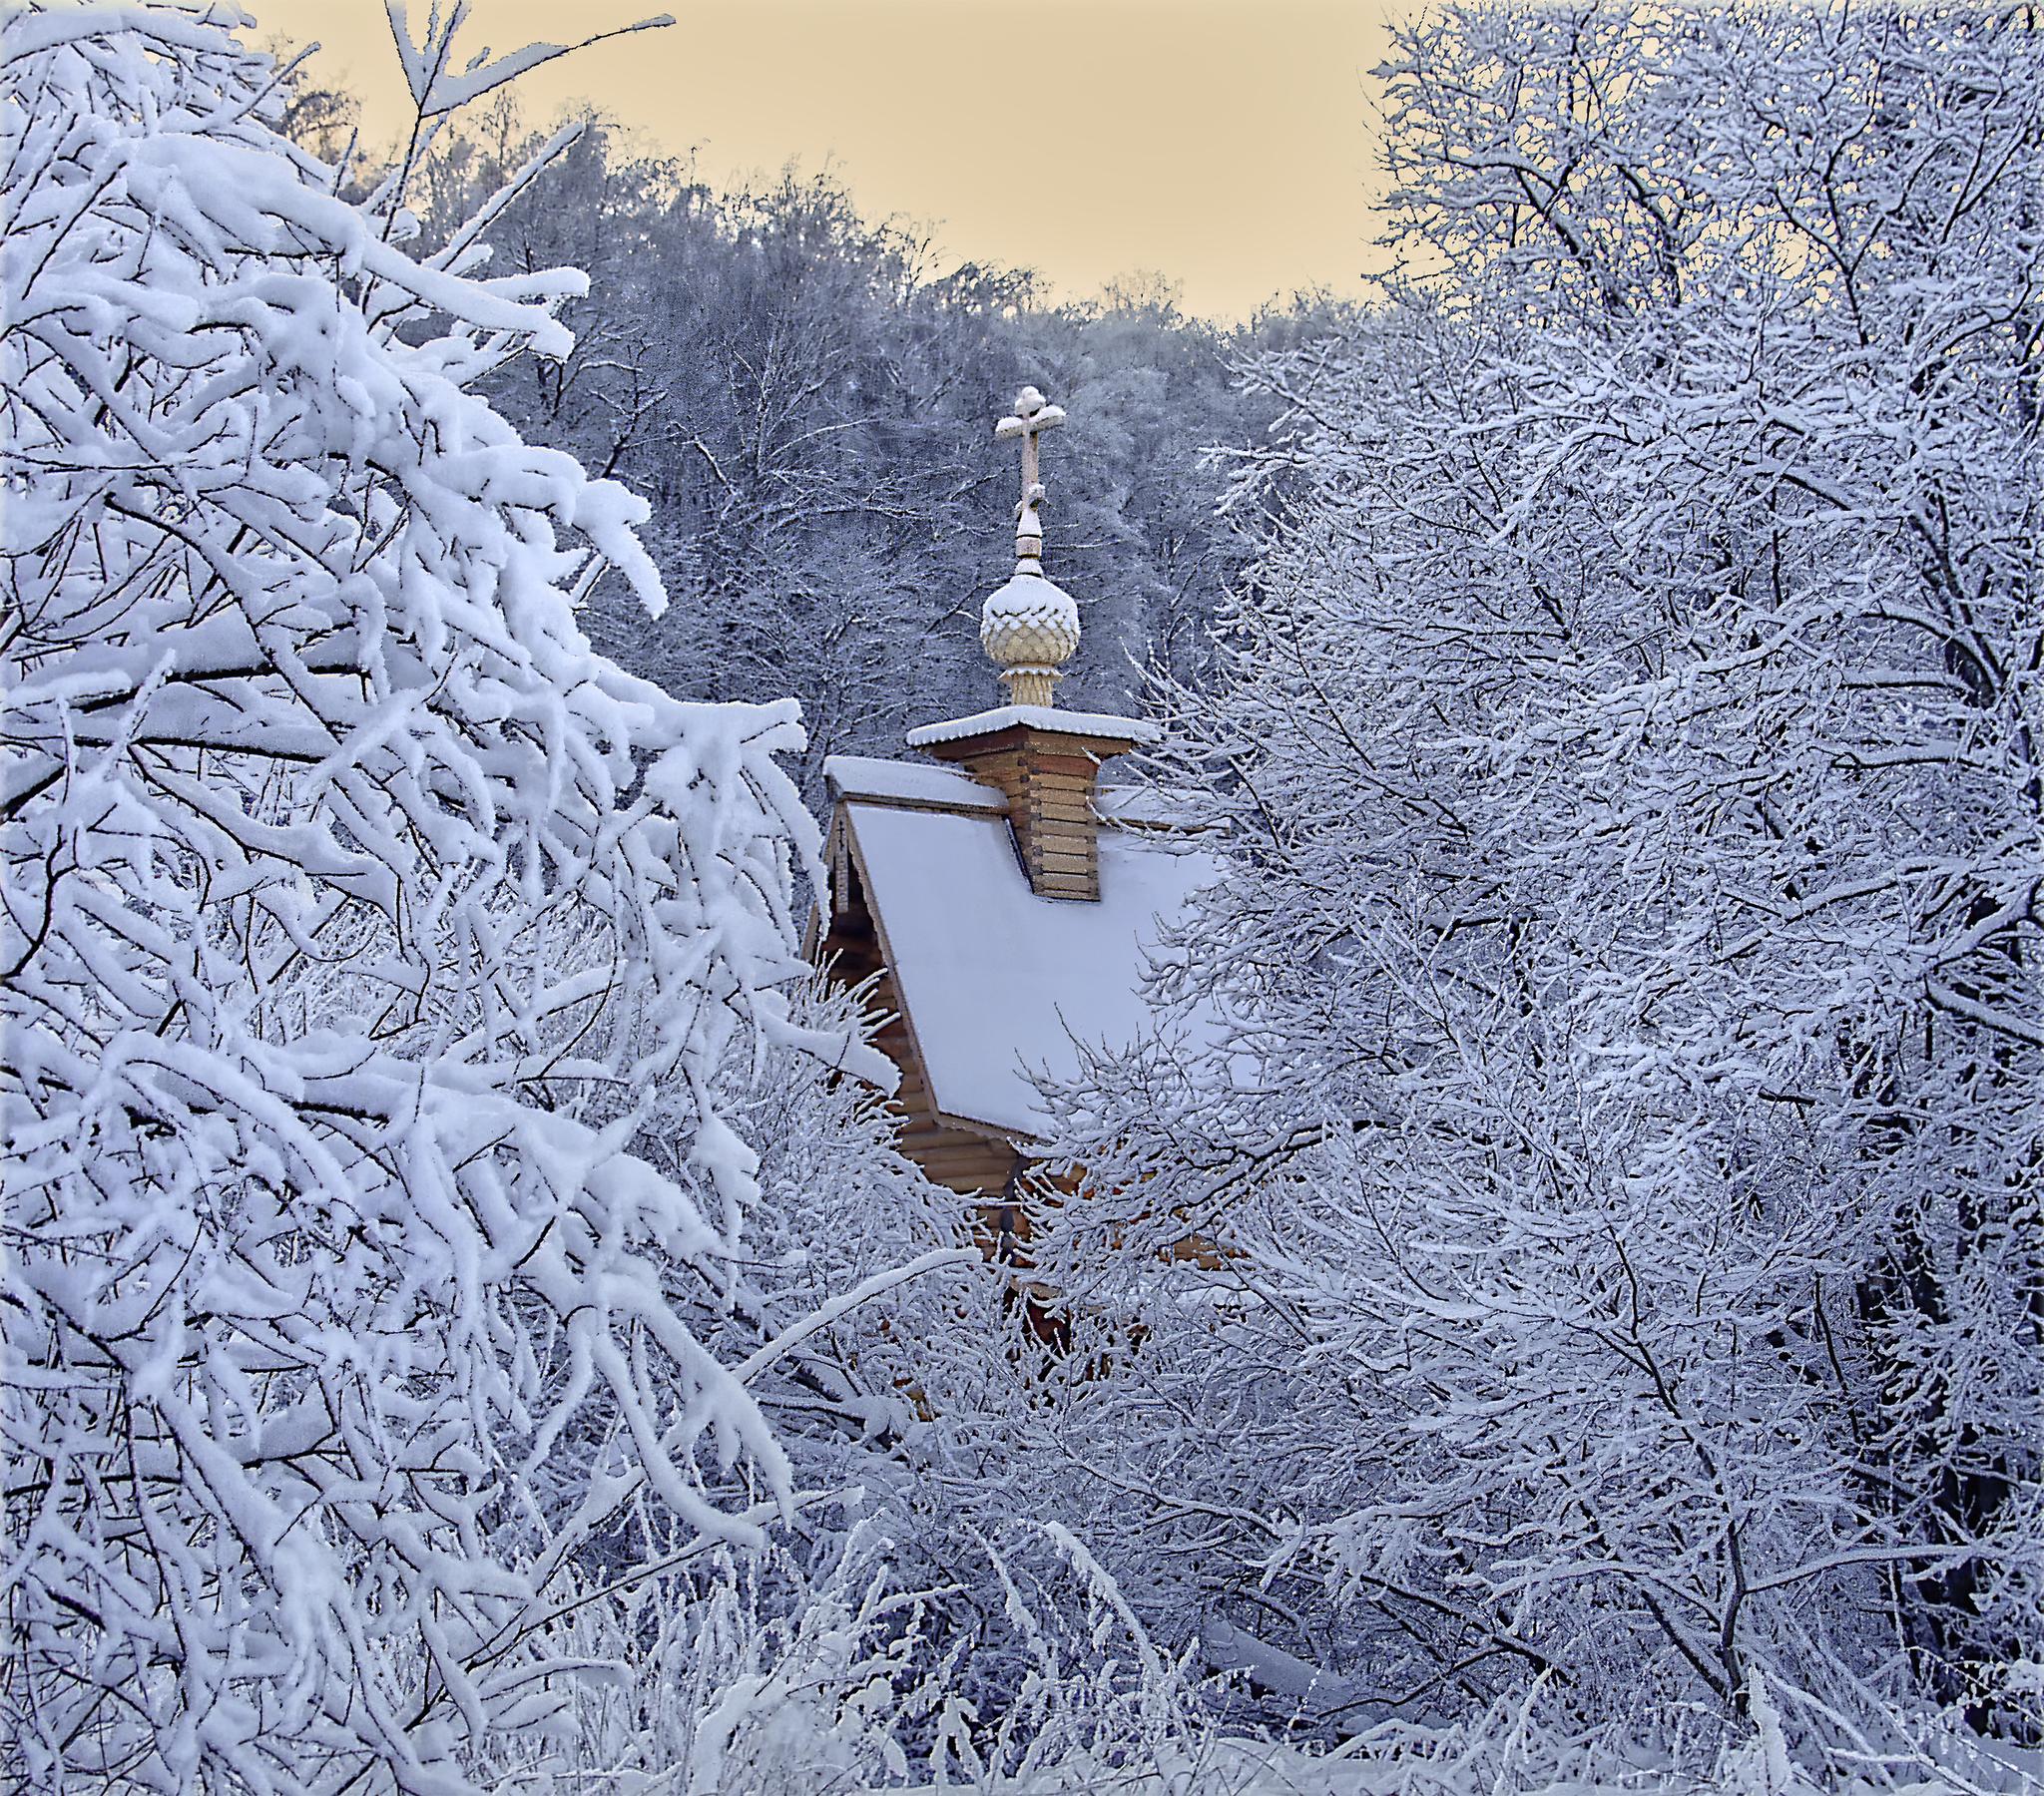 Картинка новый год зима